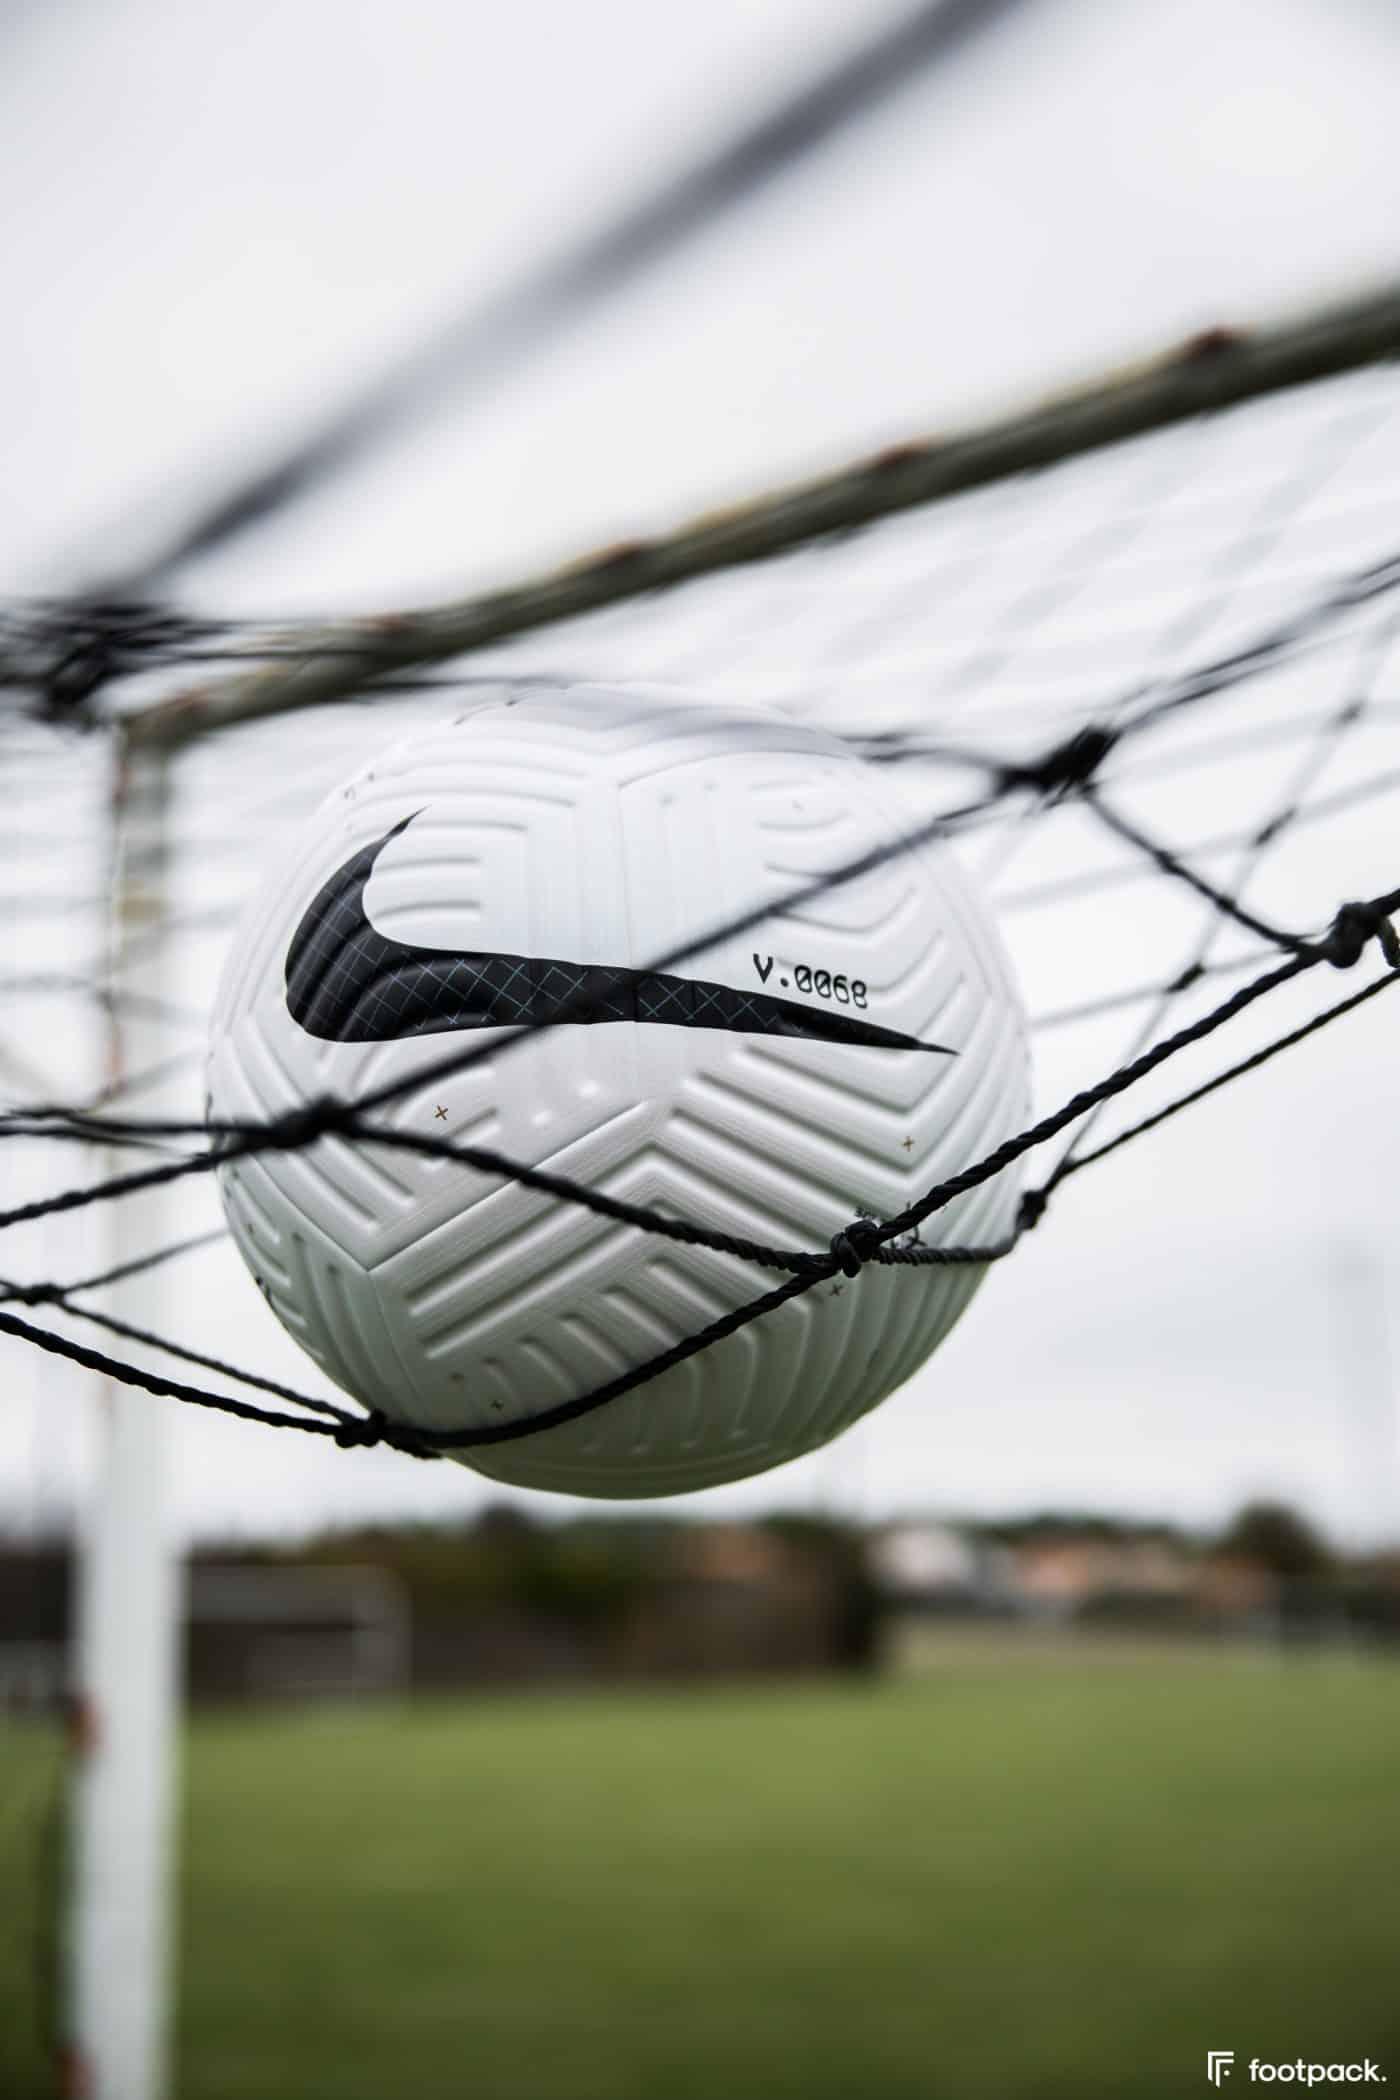 ballon-nike-flight-premier-league-serie-a-footpack-34